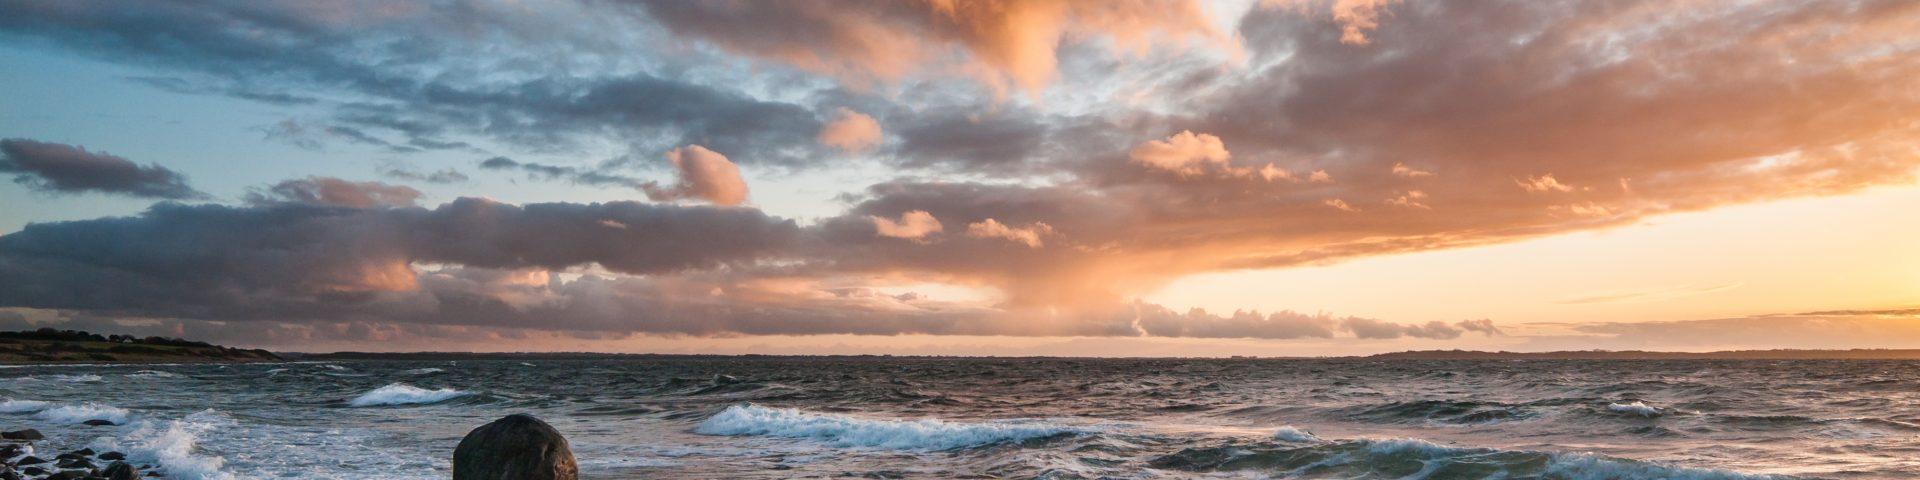 kyst, hav, klima, kystsikring, geopartner